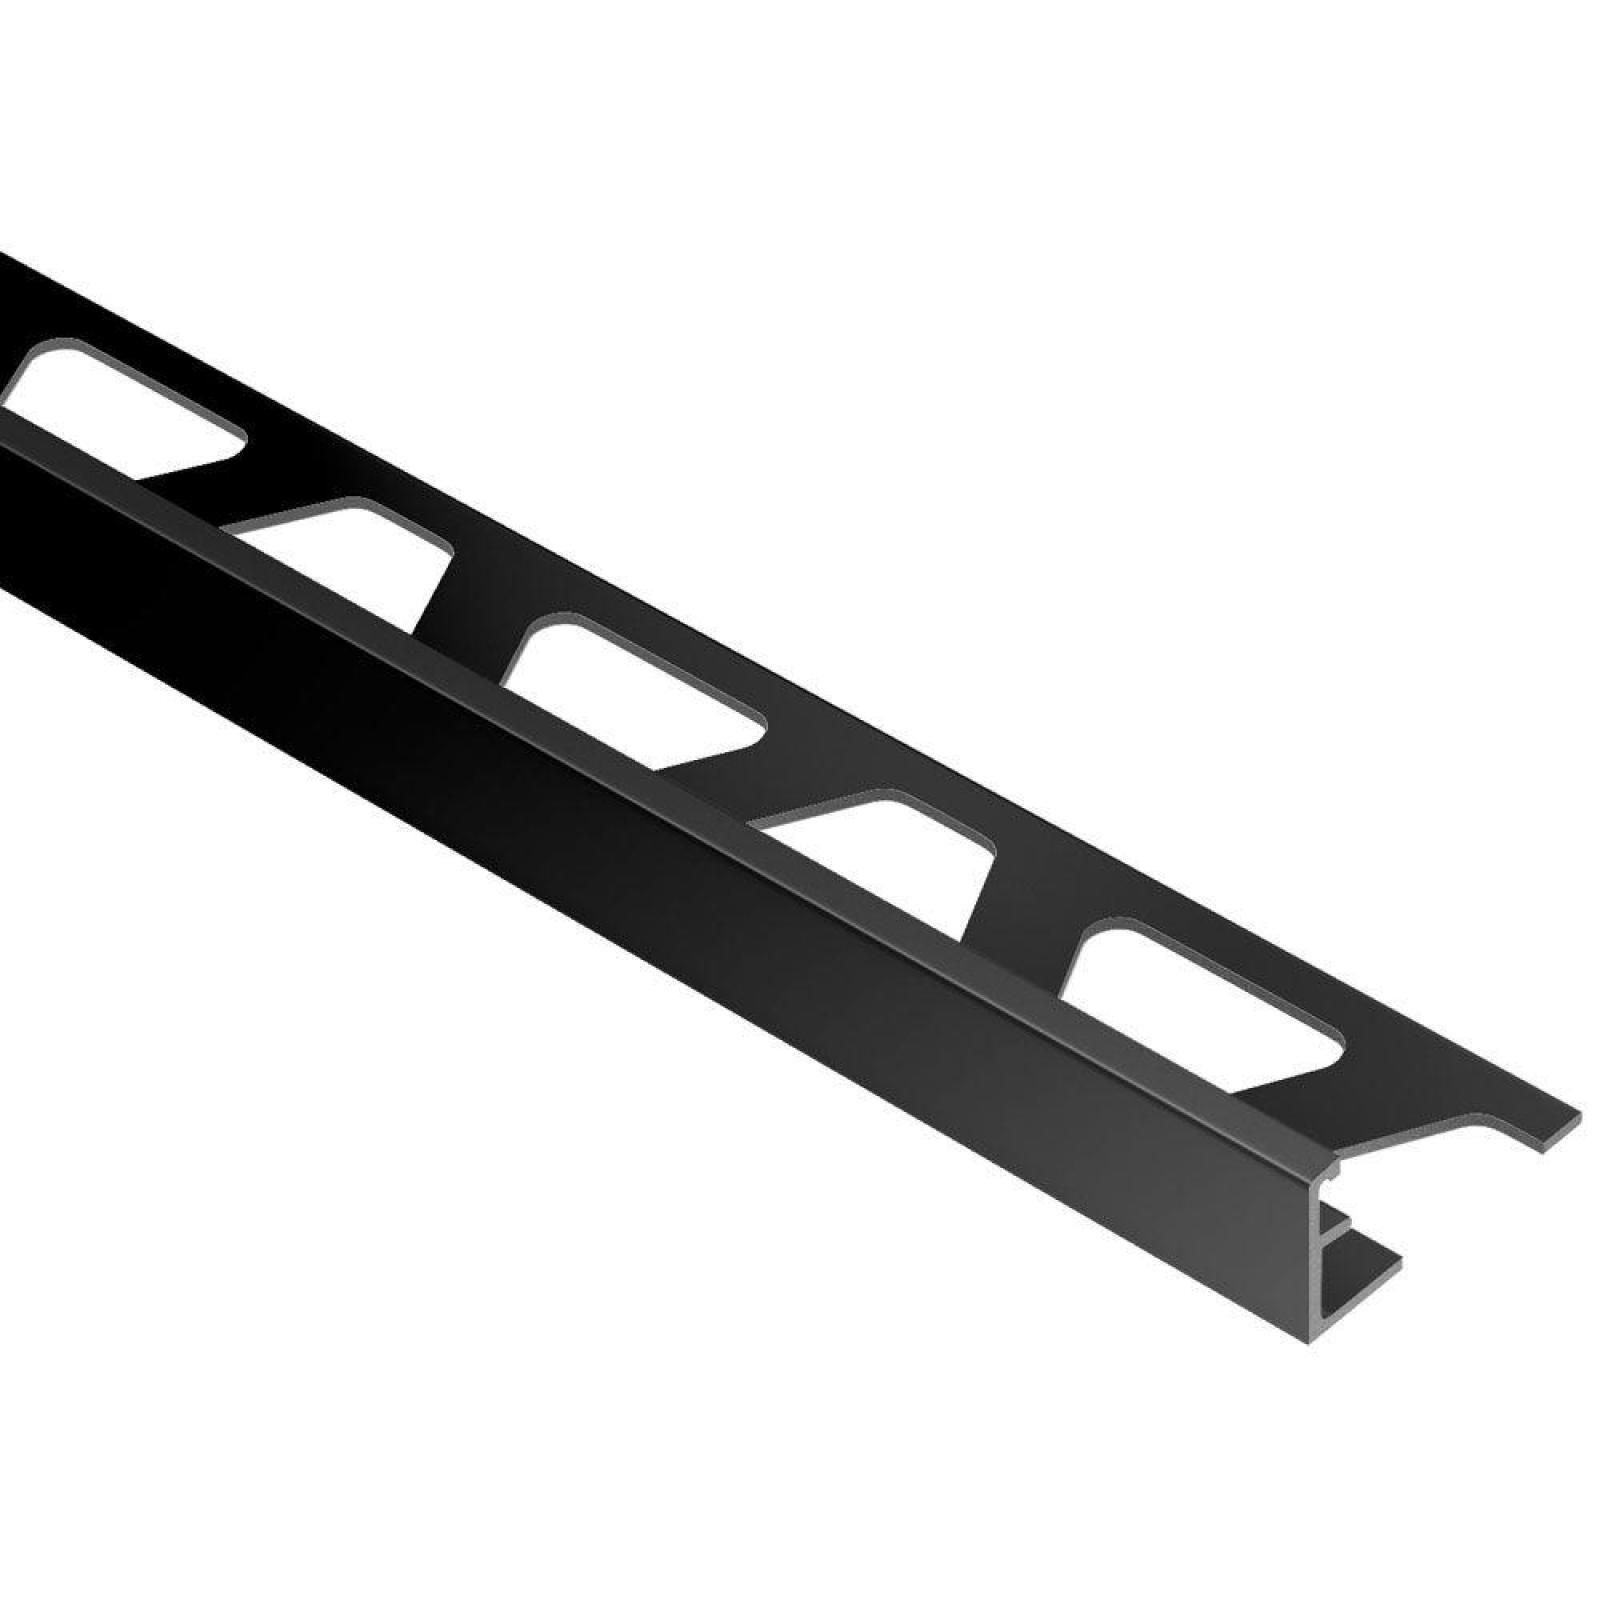 Joint Tile Edging Trim Schluter Dilex Ksn Aluminum Classic Grey Insert Movement For Sale Online Ebay